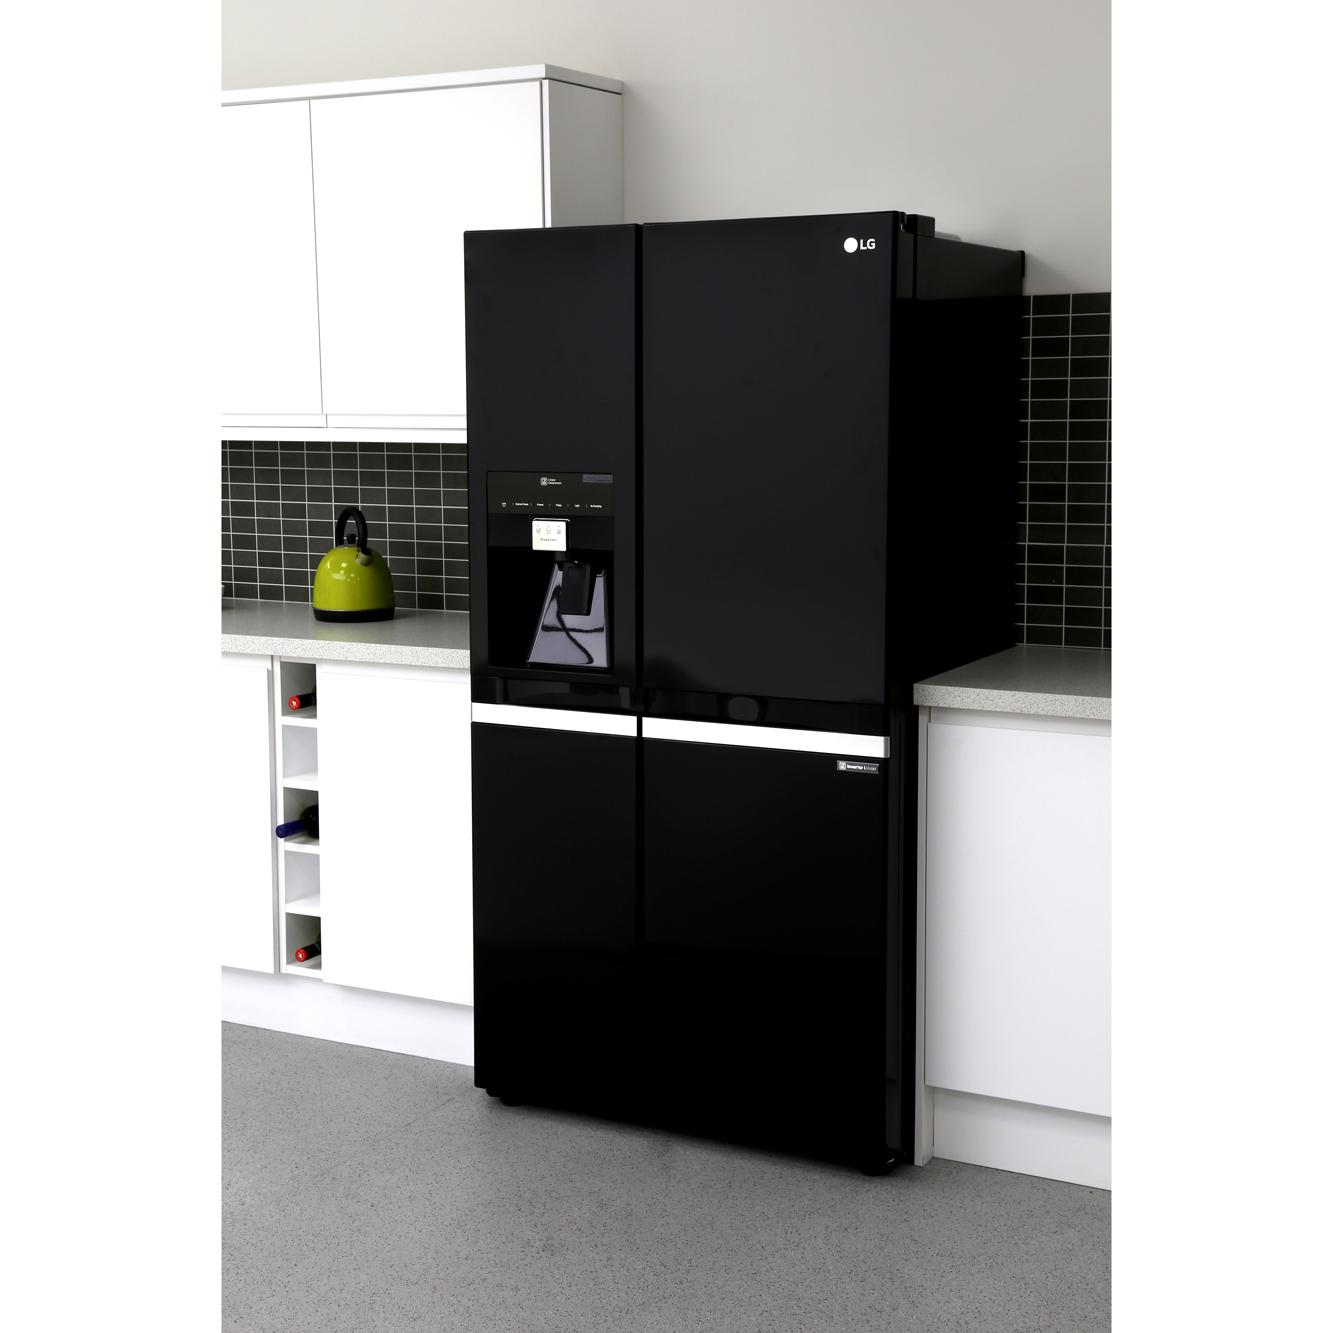 Buy Lg Gsl545wbyv American Fridge Freezer Black Marks